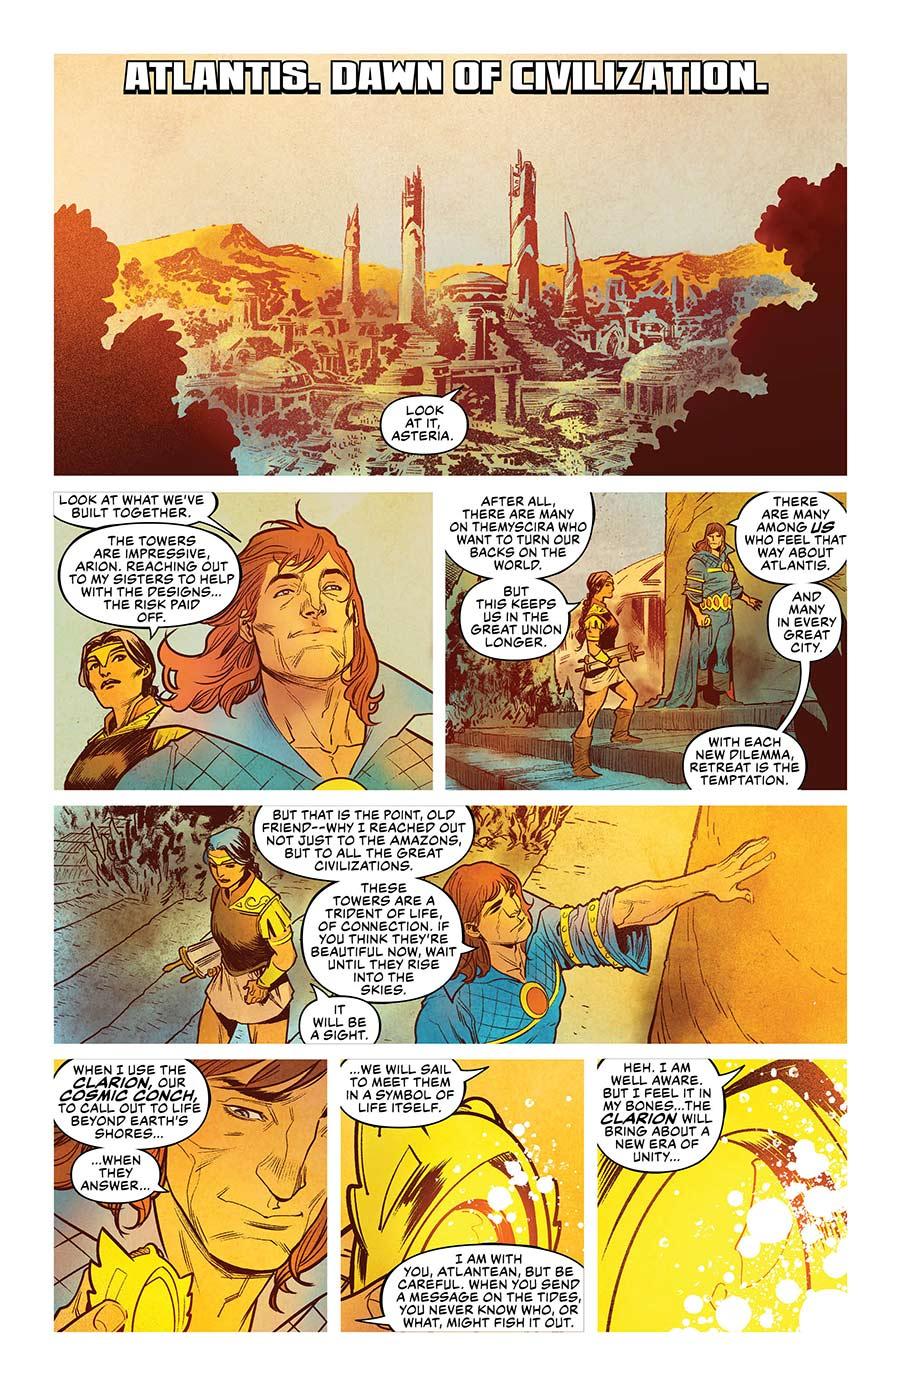 Aquaman Drowned Earth - 1-1 - DC Comics News